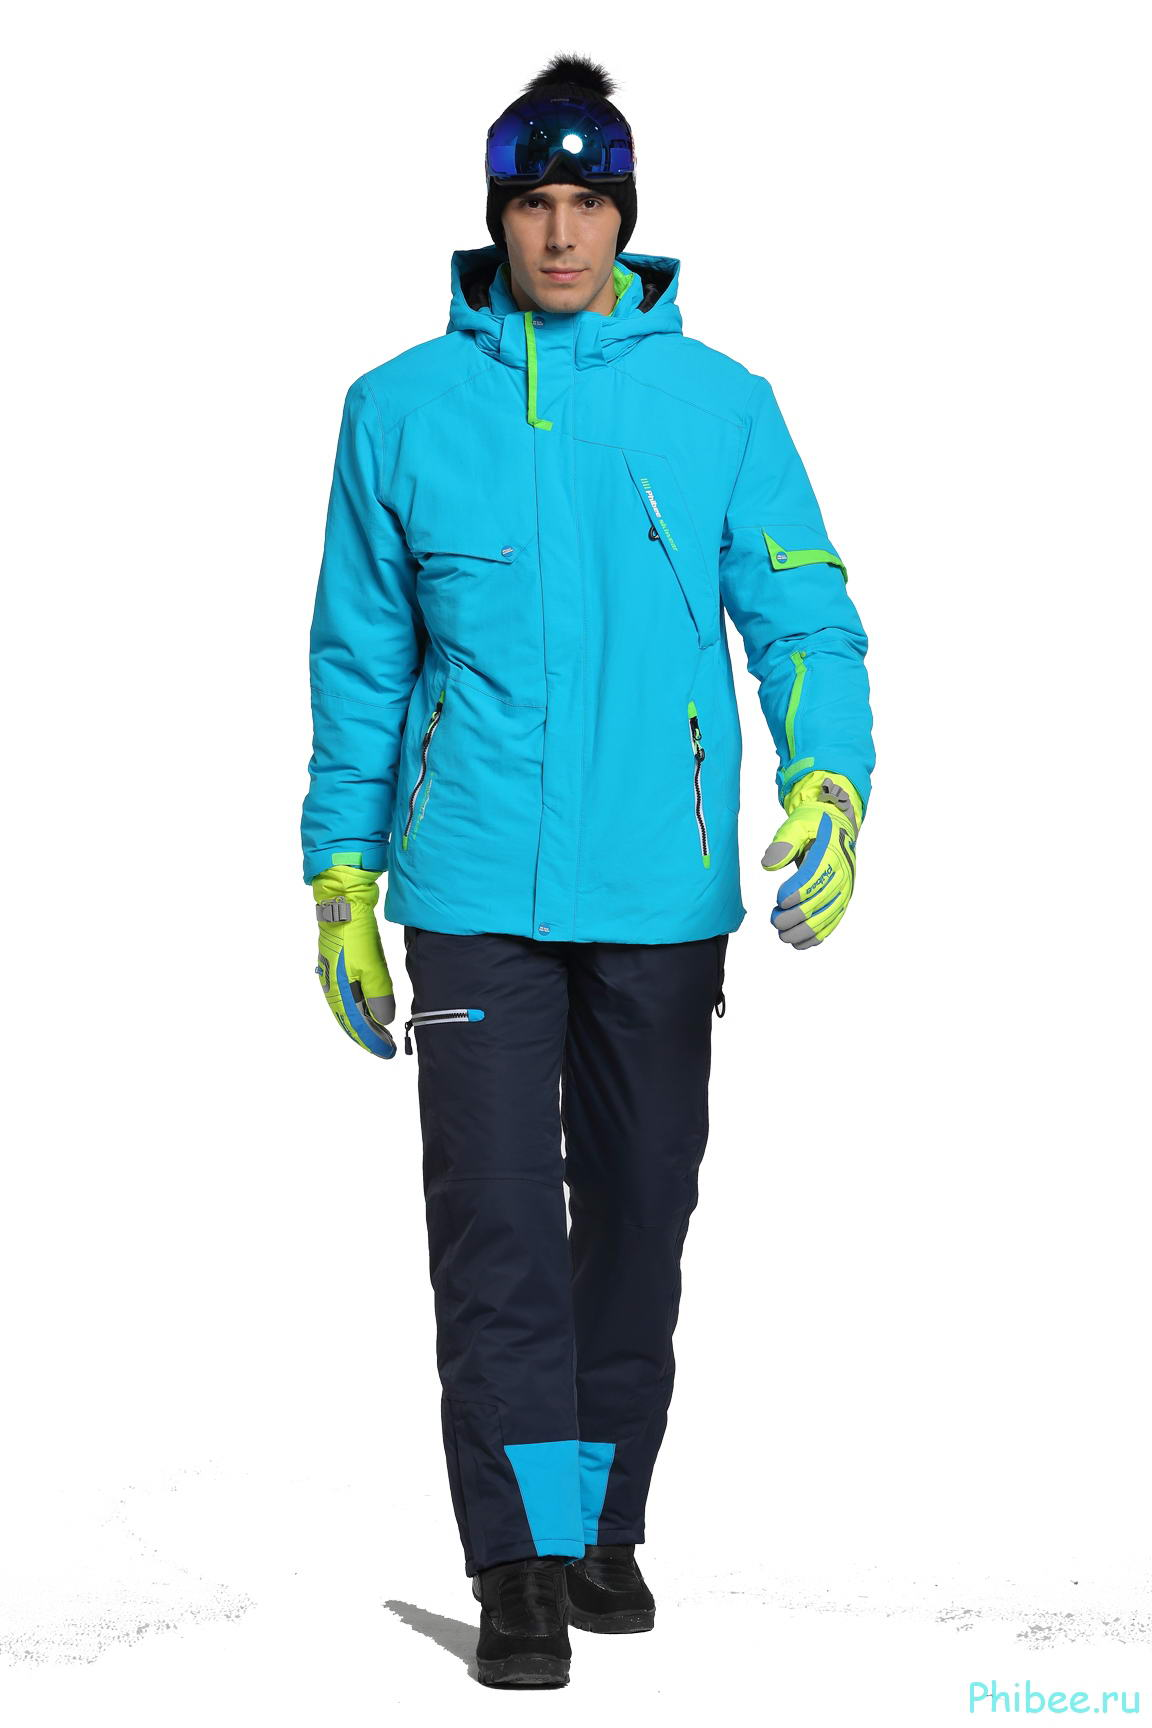 Мужской костюм для горных лыж Phibee 8025